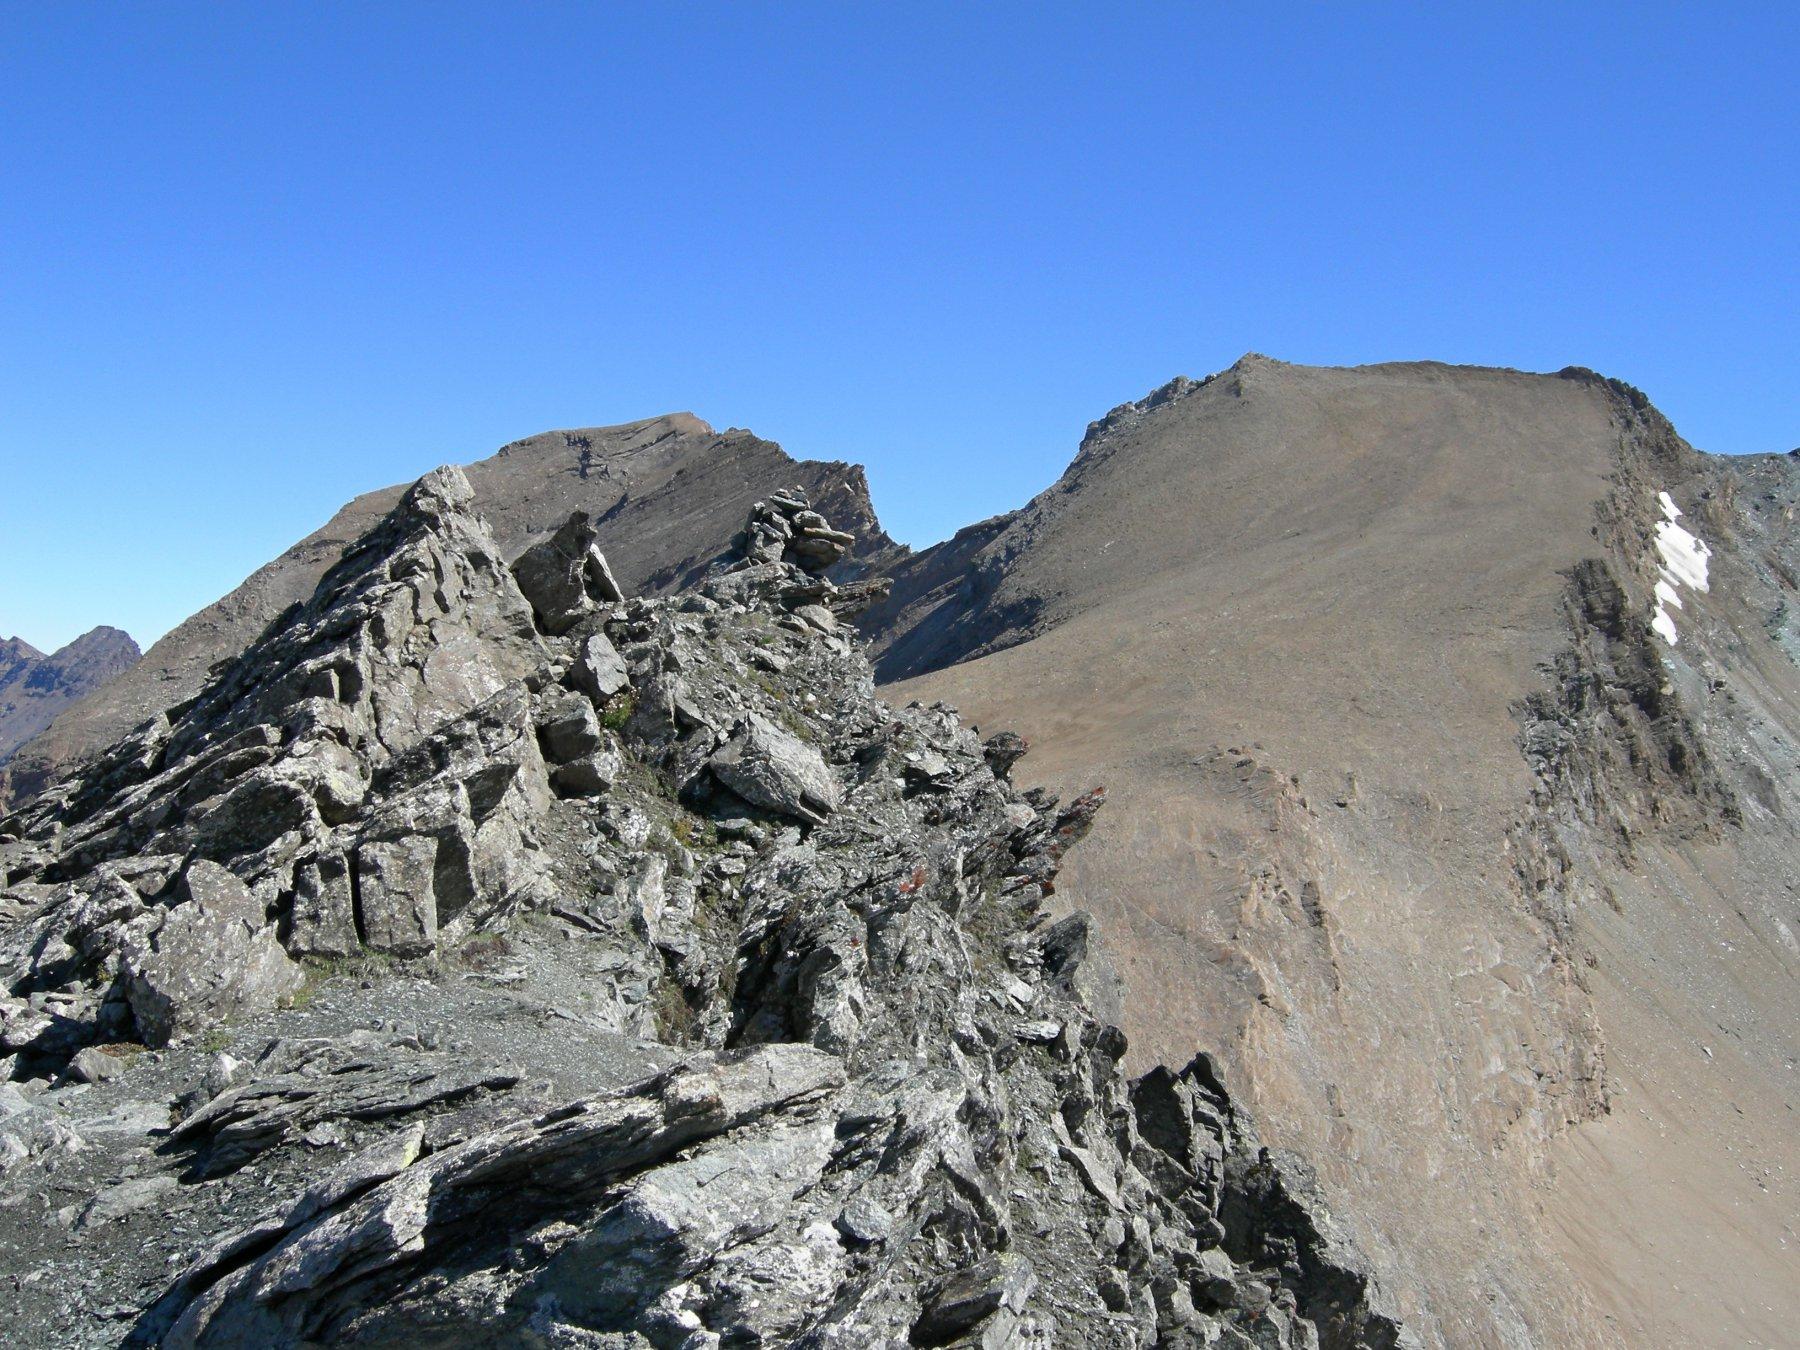 punta nord e Taou Blanc di sfondo